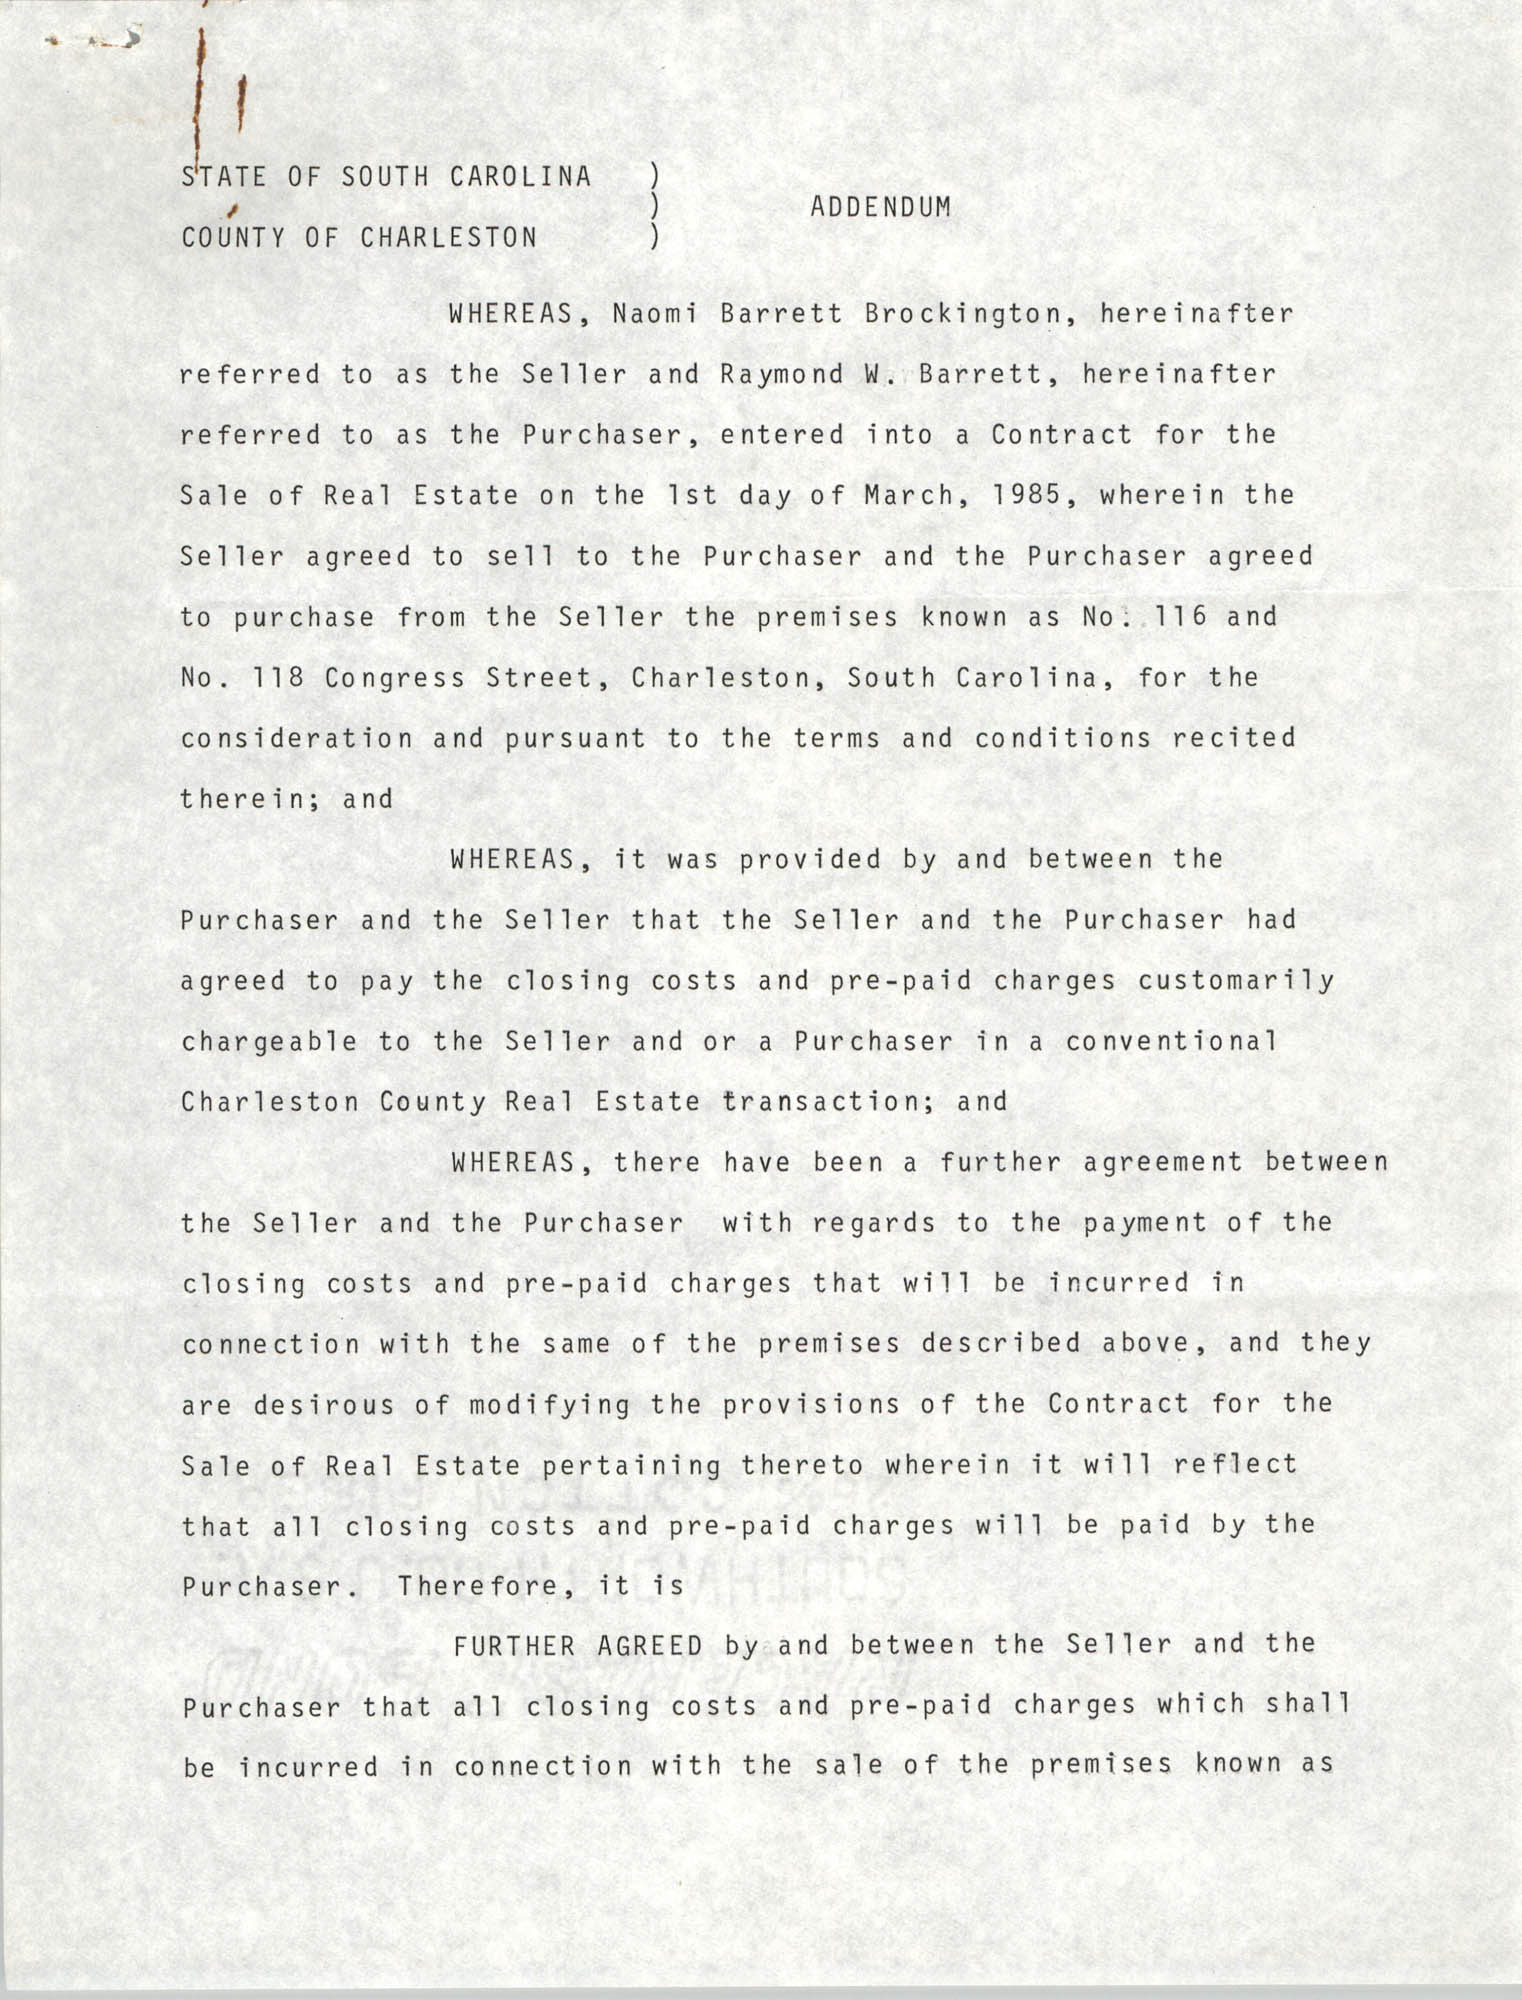 Addendum, State of South Carolina, County of Charleston, Naomi Barrett Brockington and Raymond Barrett, March 16, 1985